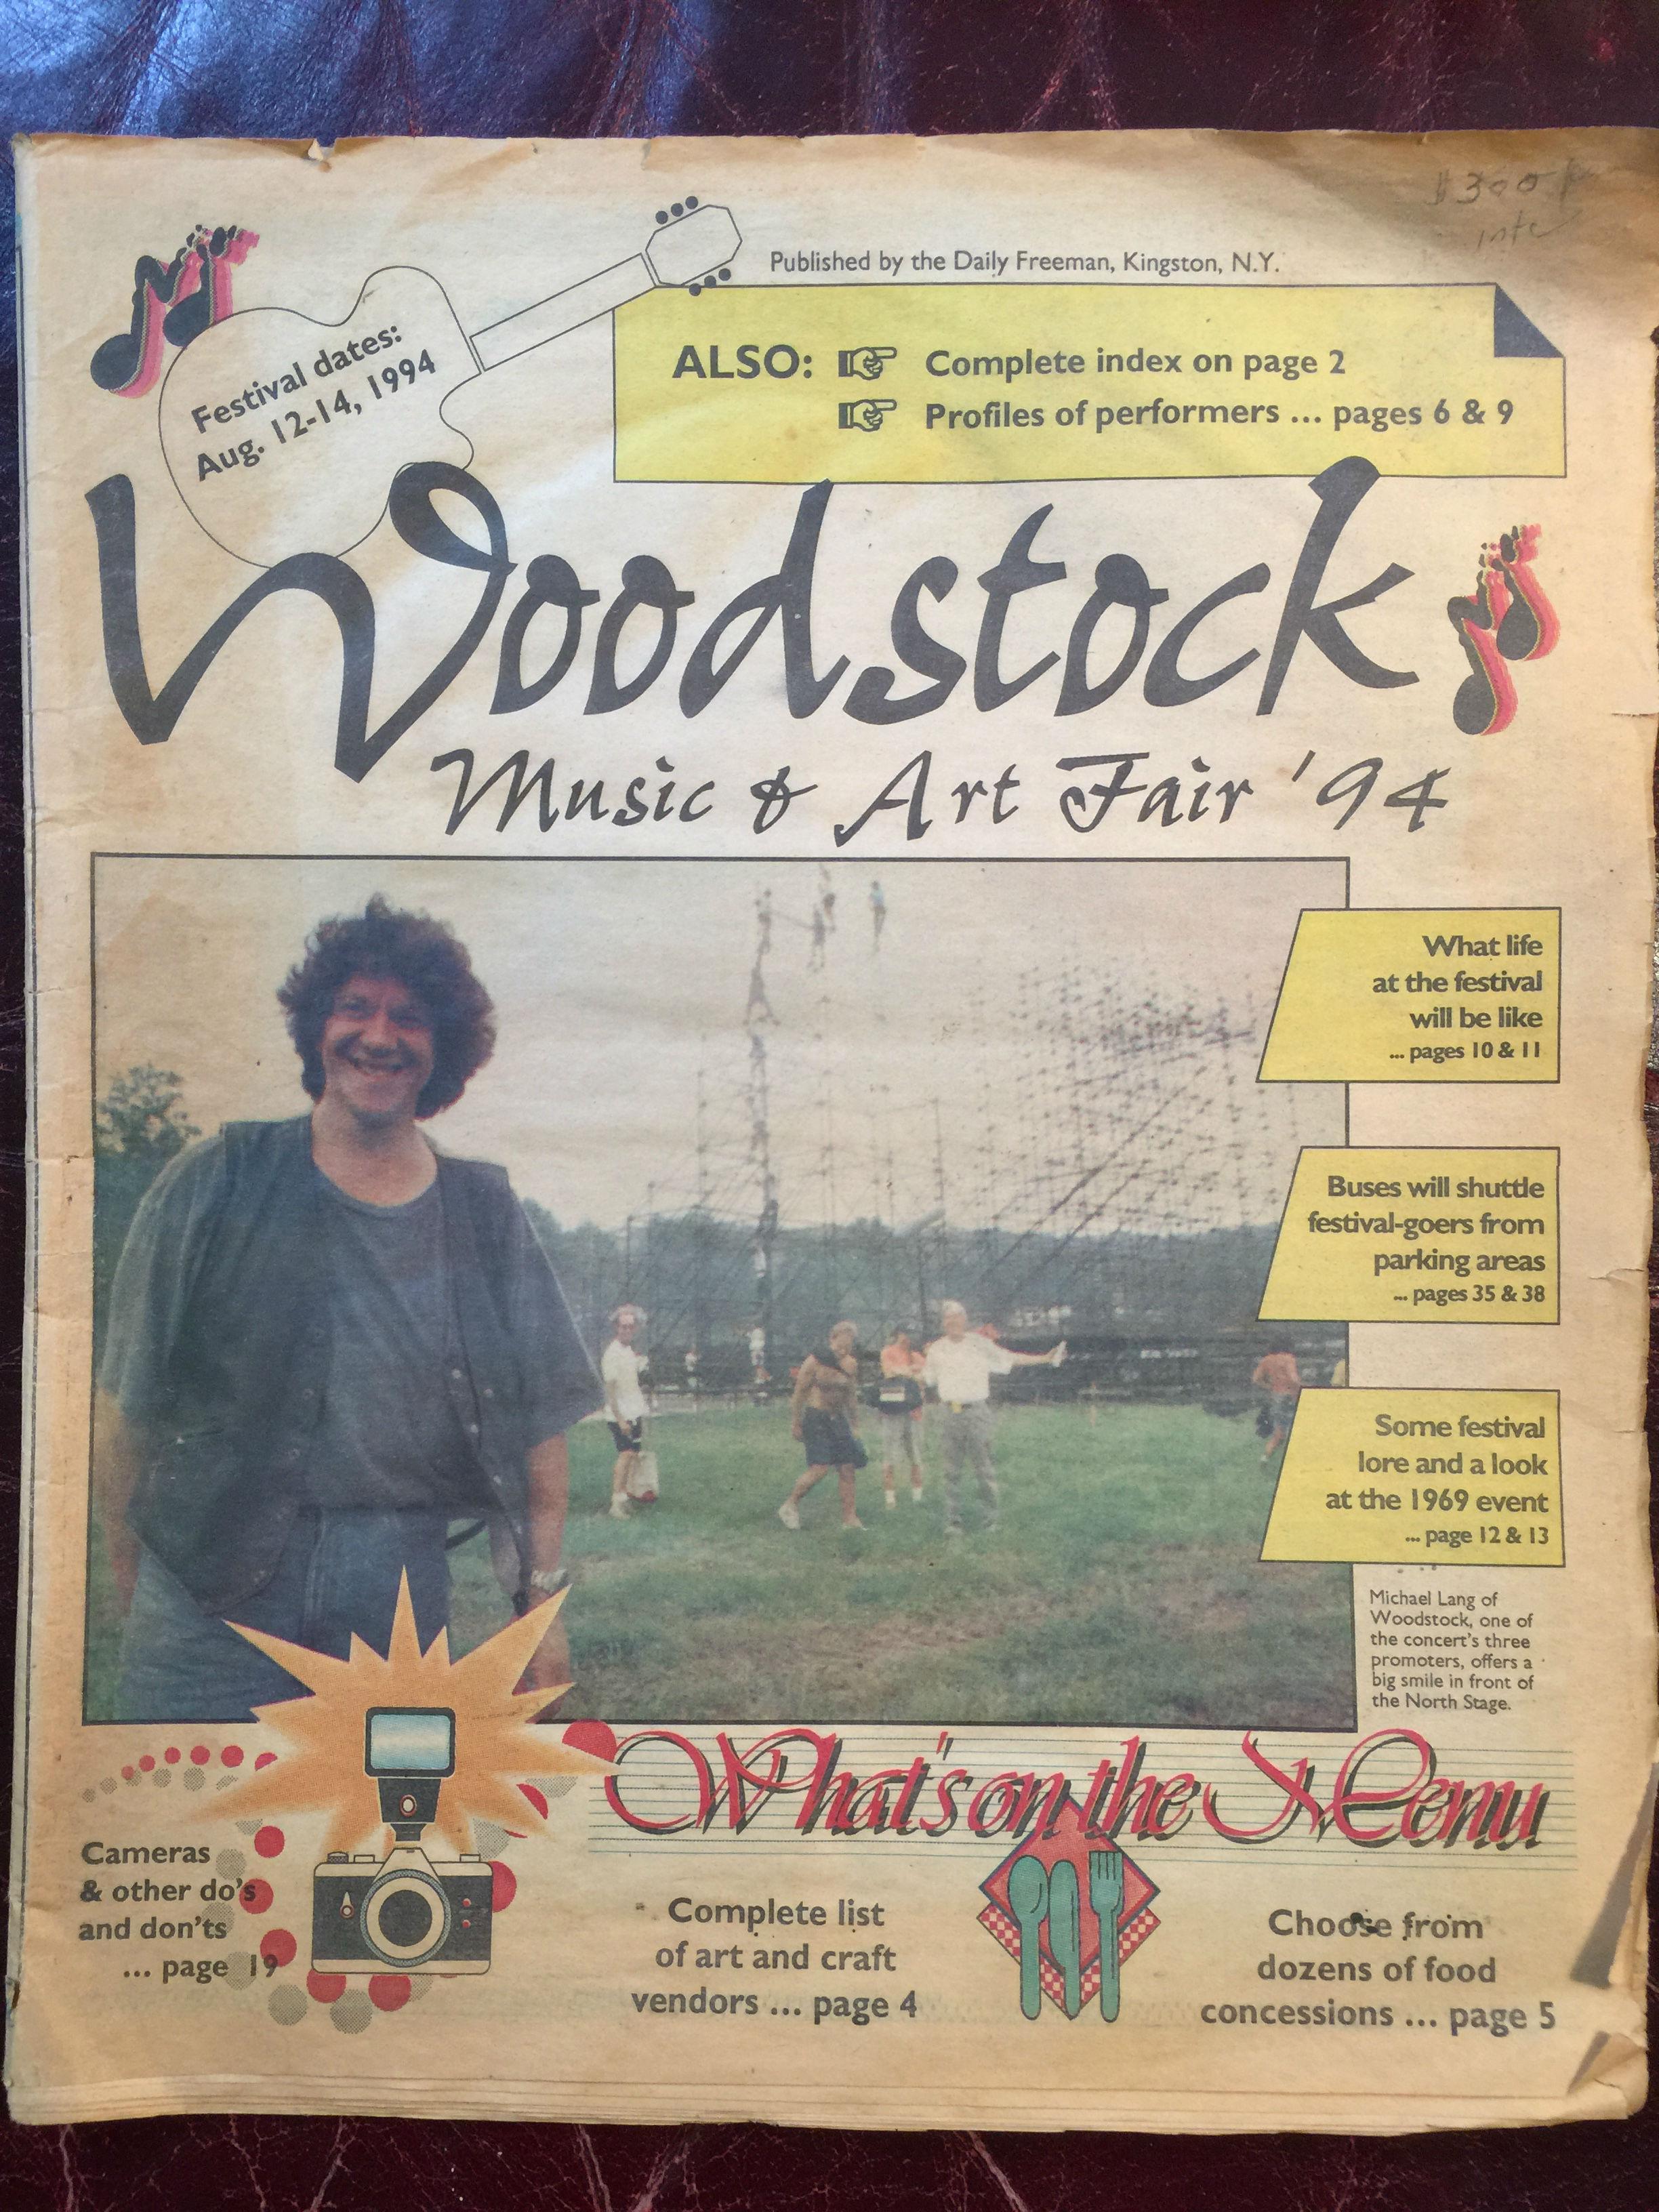 WOODSTOCK MUSIC AND ART FAIR 94 WOODSTOCK II